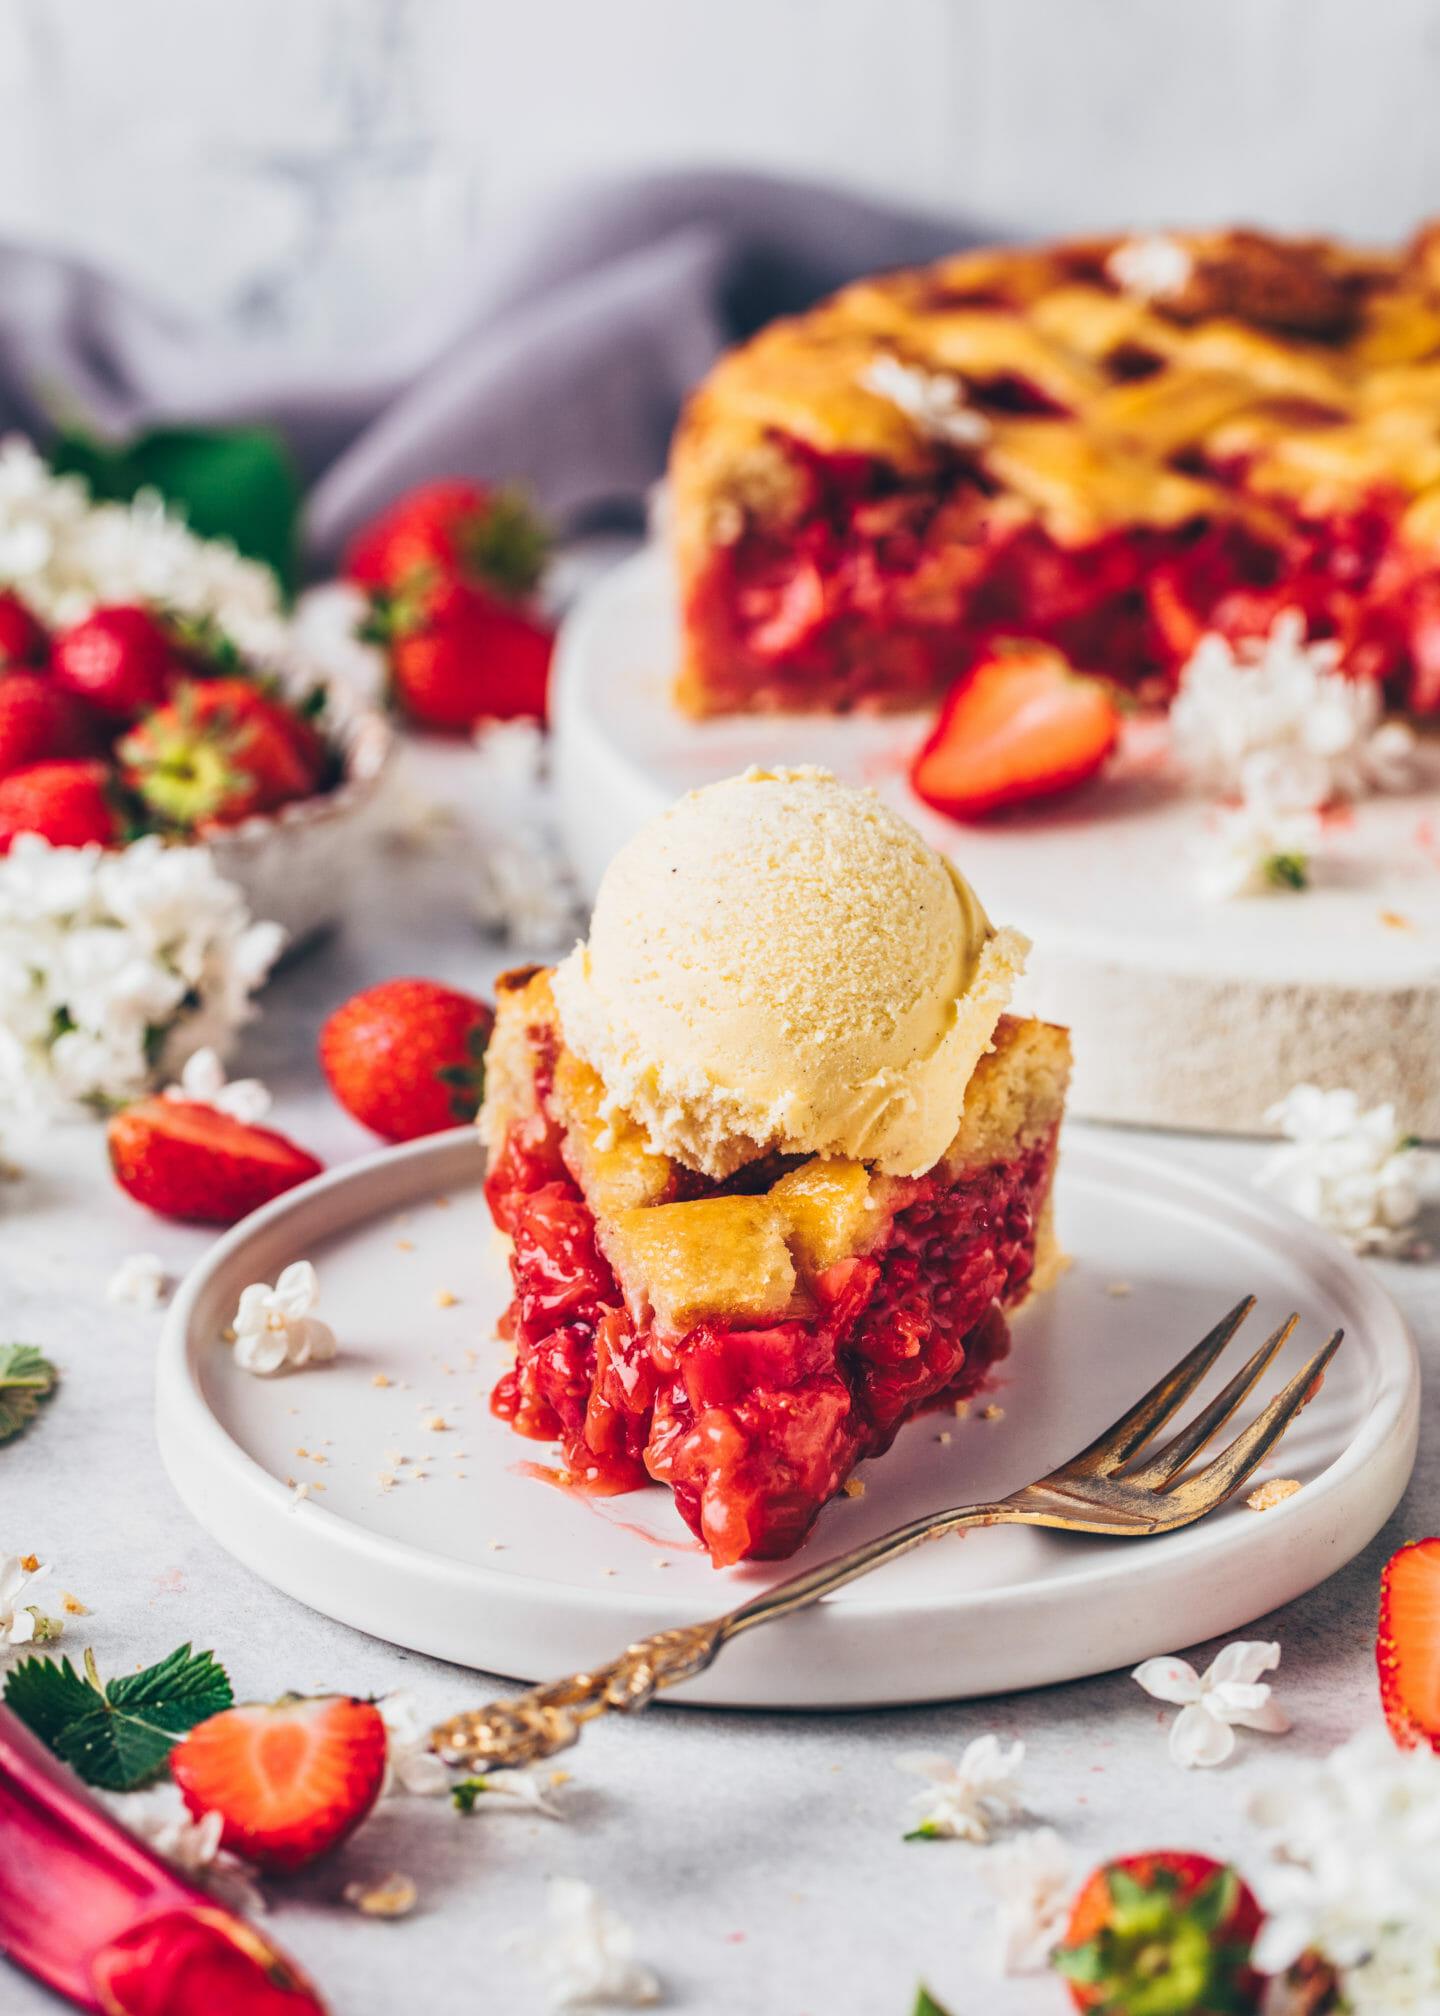 Erdbeer-Rhabarber Pie mit Vanille-Eis